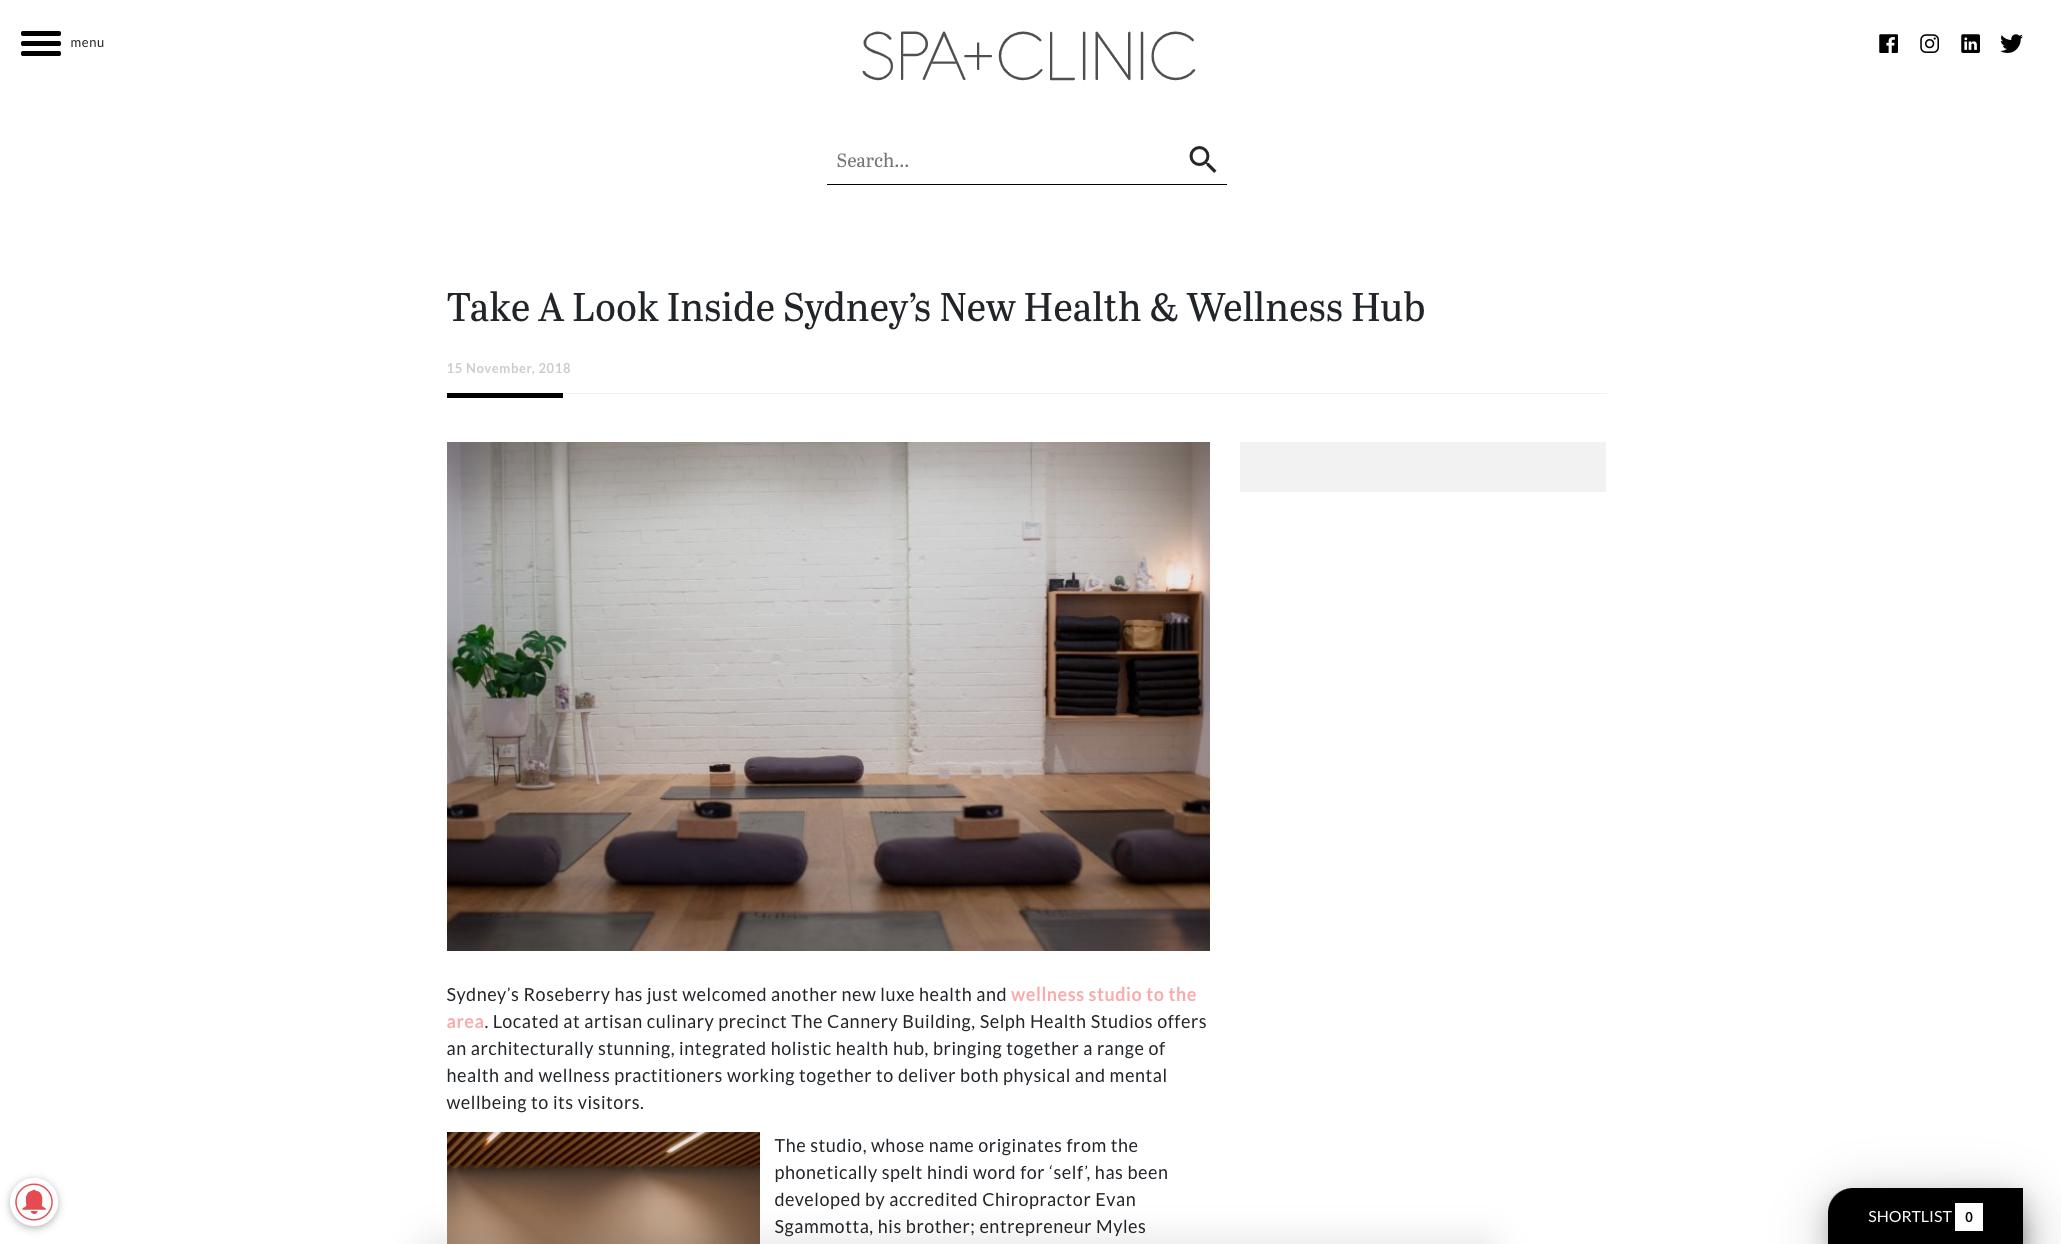 Take A Look Inside Sydney's New Health & Wellness Hub - Spa + Clinic - Selph Health Studios